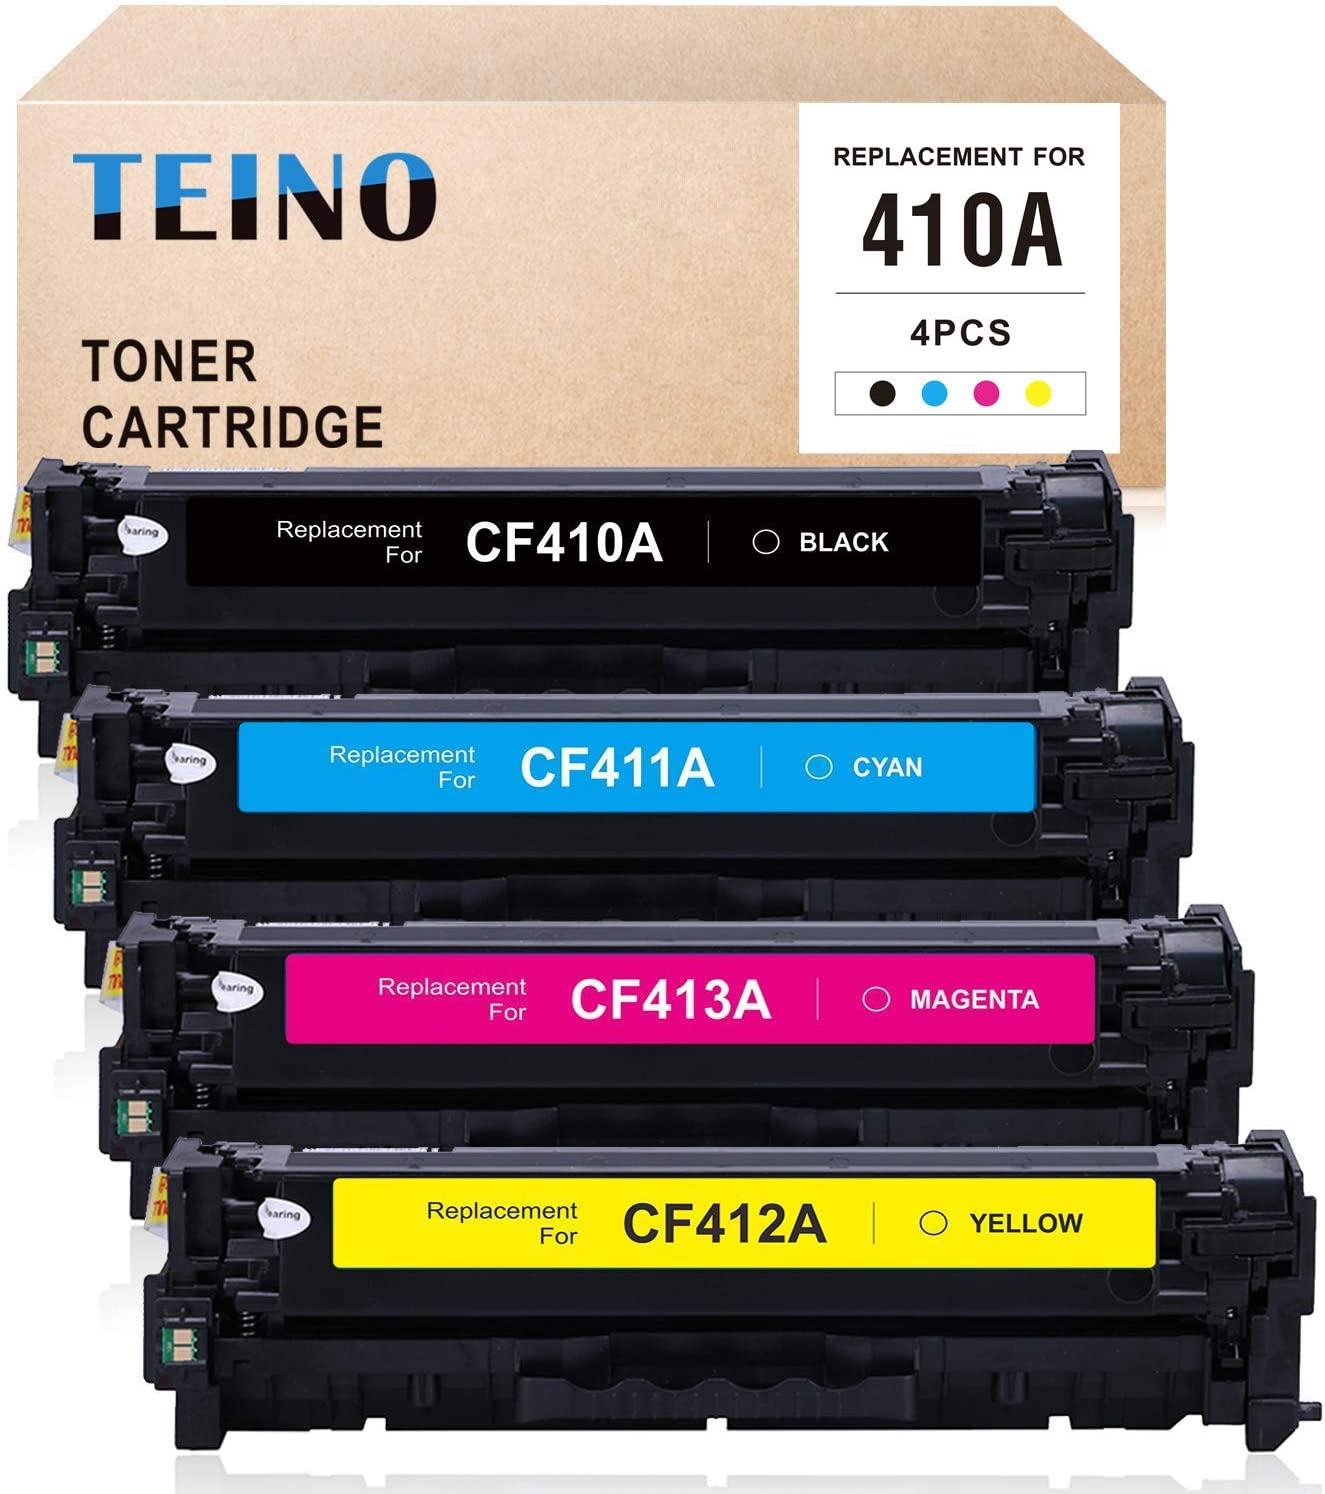 TEINO Compatible Toner Cartridge Replacement for HP 410A CF410A CF411A CF412A CF413A for Color Laserjet Pro MFP M477fnw M477fdw M477fdn Pro M452nw M452dw M452dn (Black, Cyan, Magenta, Yellow, 4 Pack)